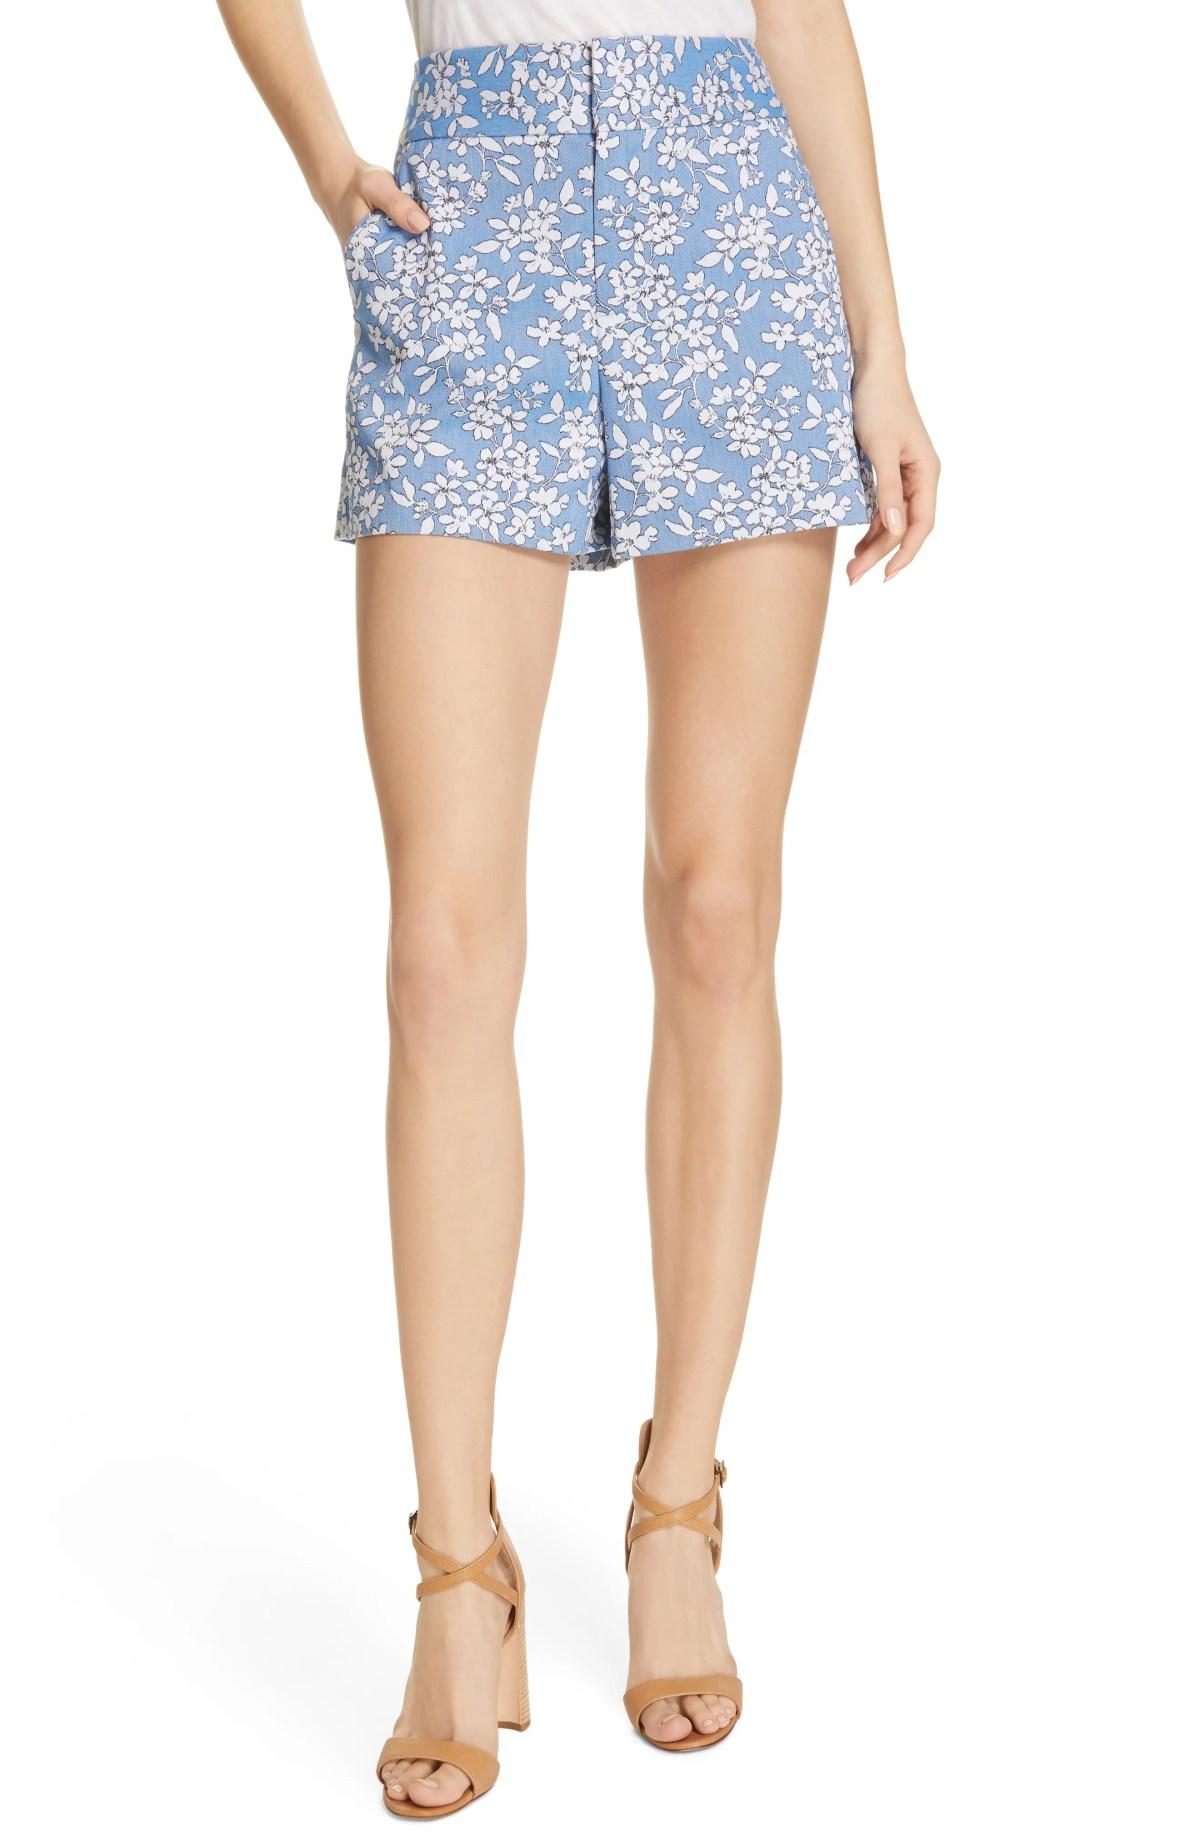 ALICE + OLIVIA High Waist Floral Shorts, Main, color, CORNFLOWER/ WHITE